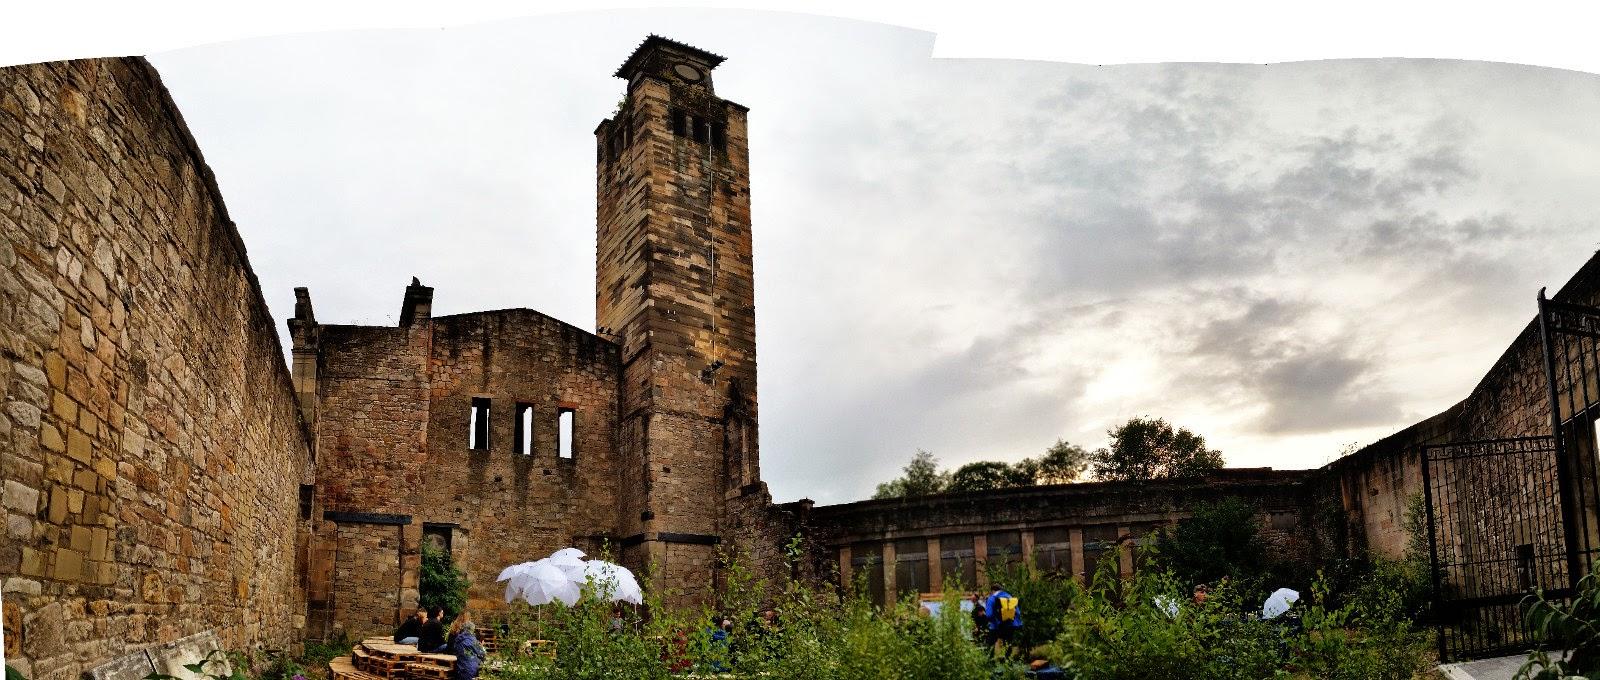 Caledonia Road Church, Gorbals, Glasgow